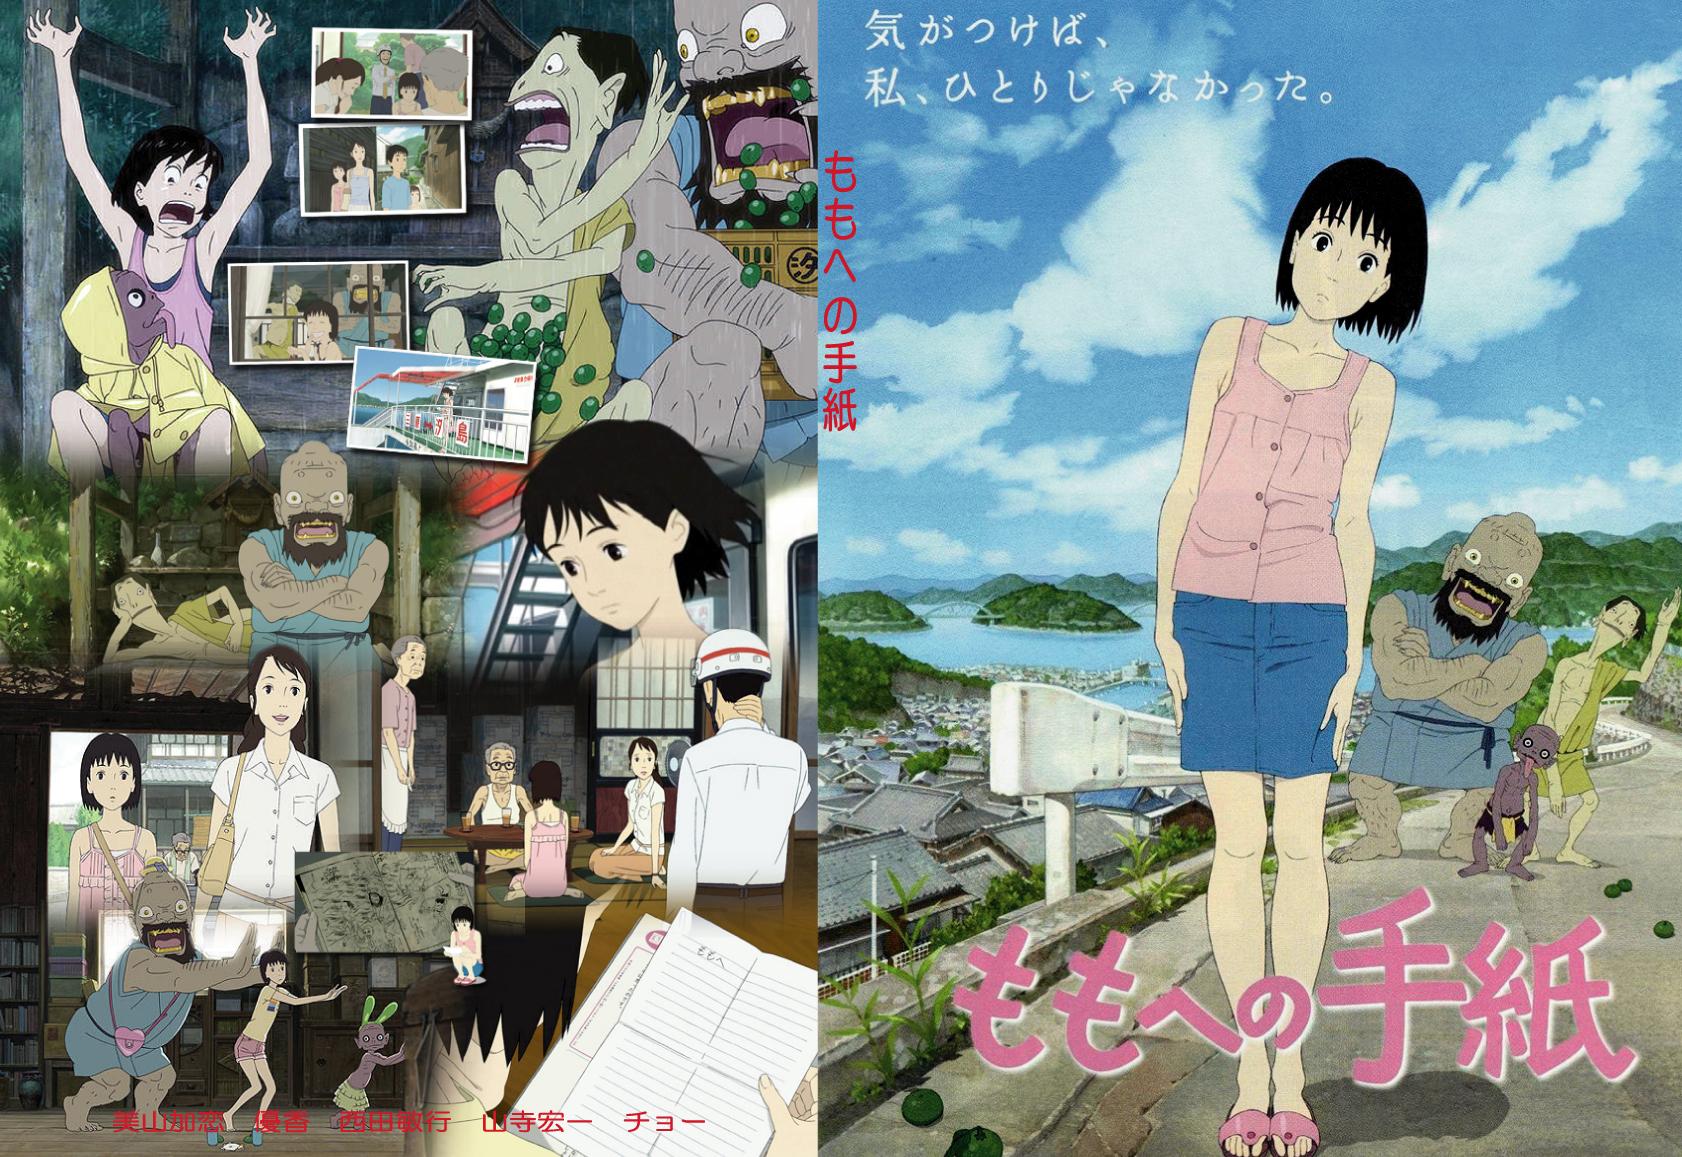 Black Wallpaper Girl Hd Review 「ももへの手紙」 Momo E No Tegami A Letter To Momo